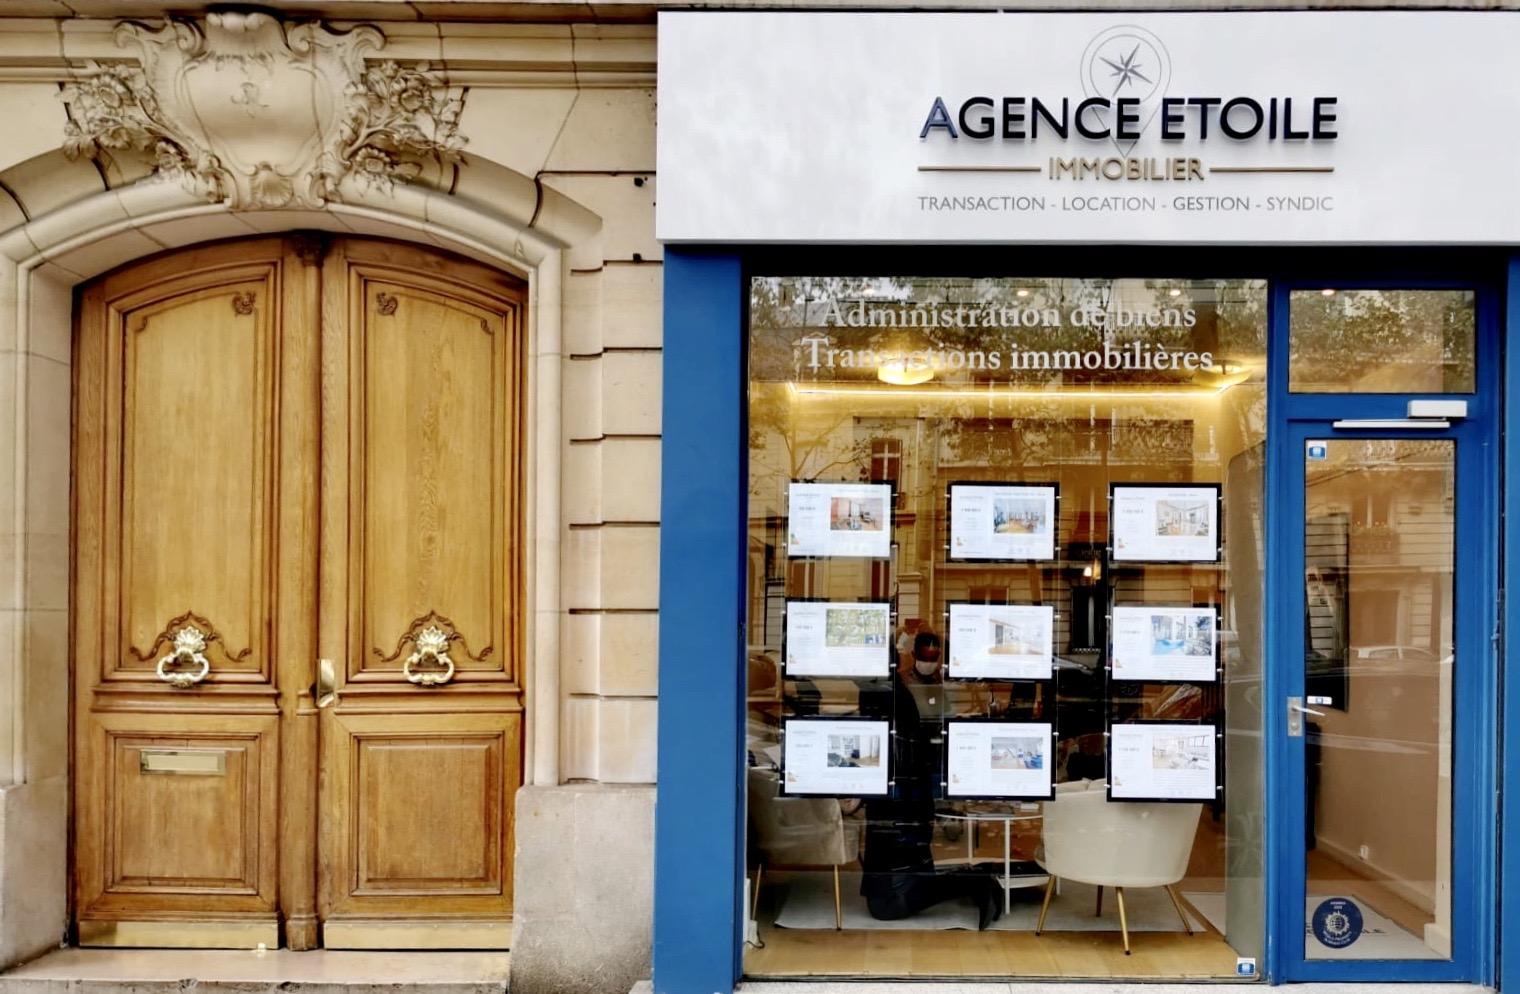 Agence Etoile Rive Gauche